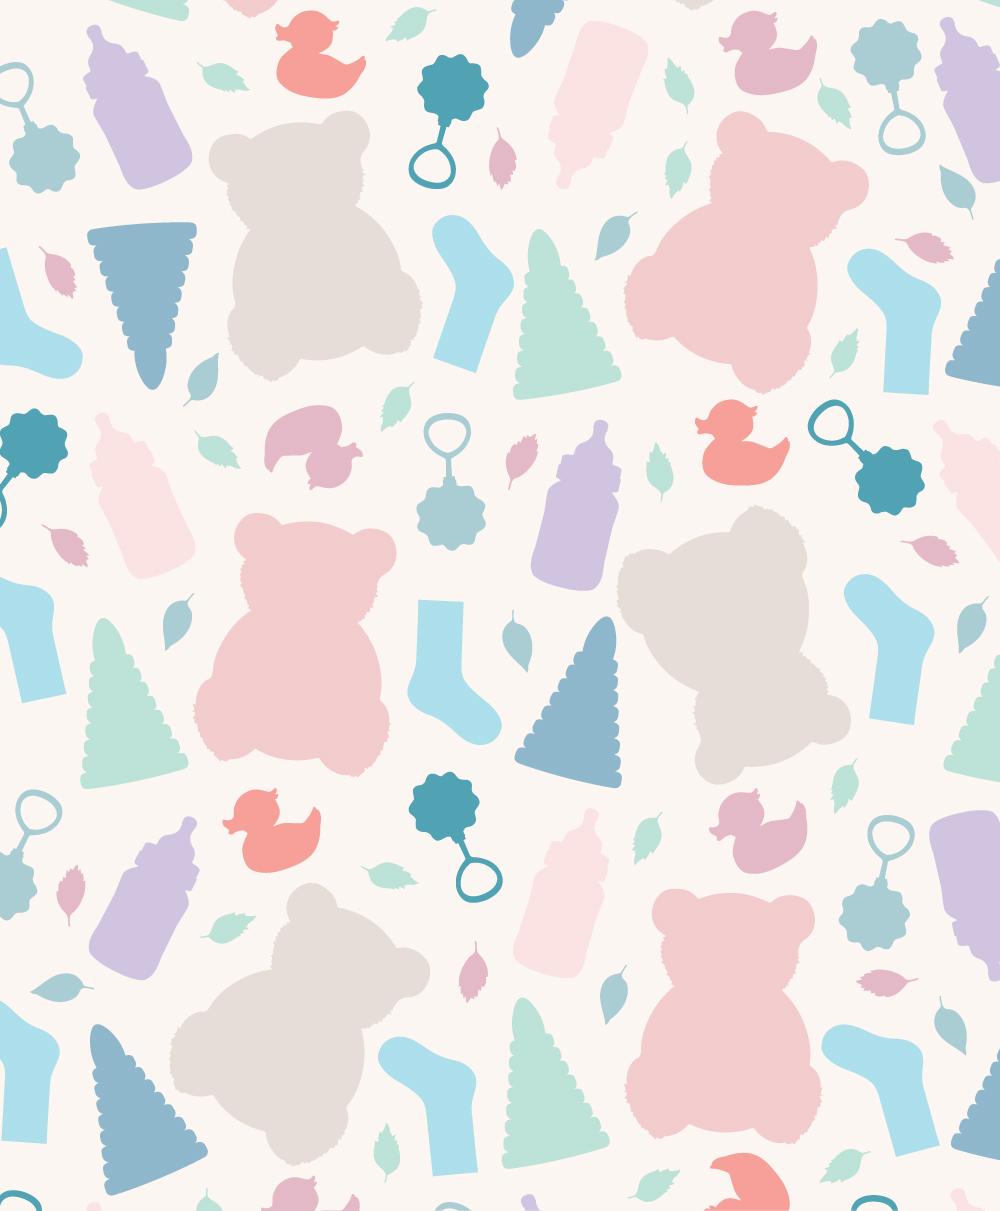 justbenice-BioMio-pattern-4.jpg